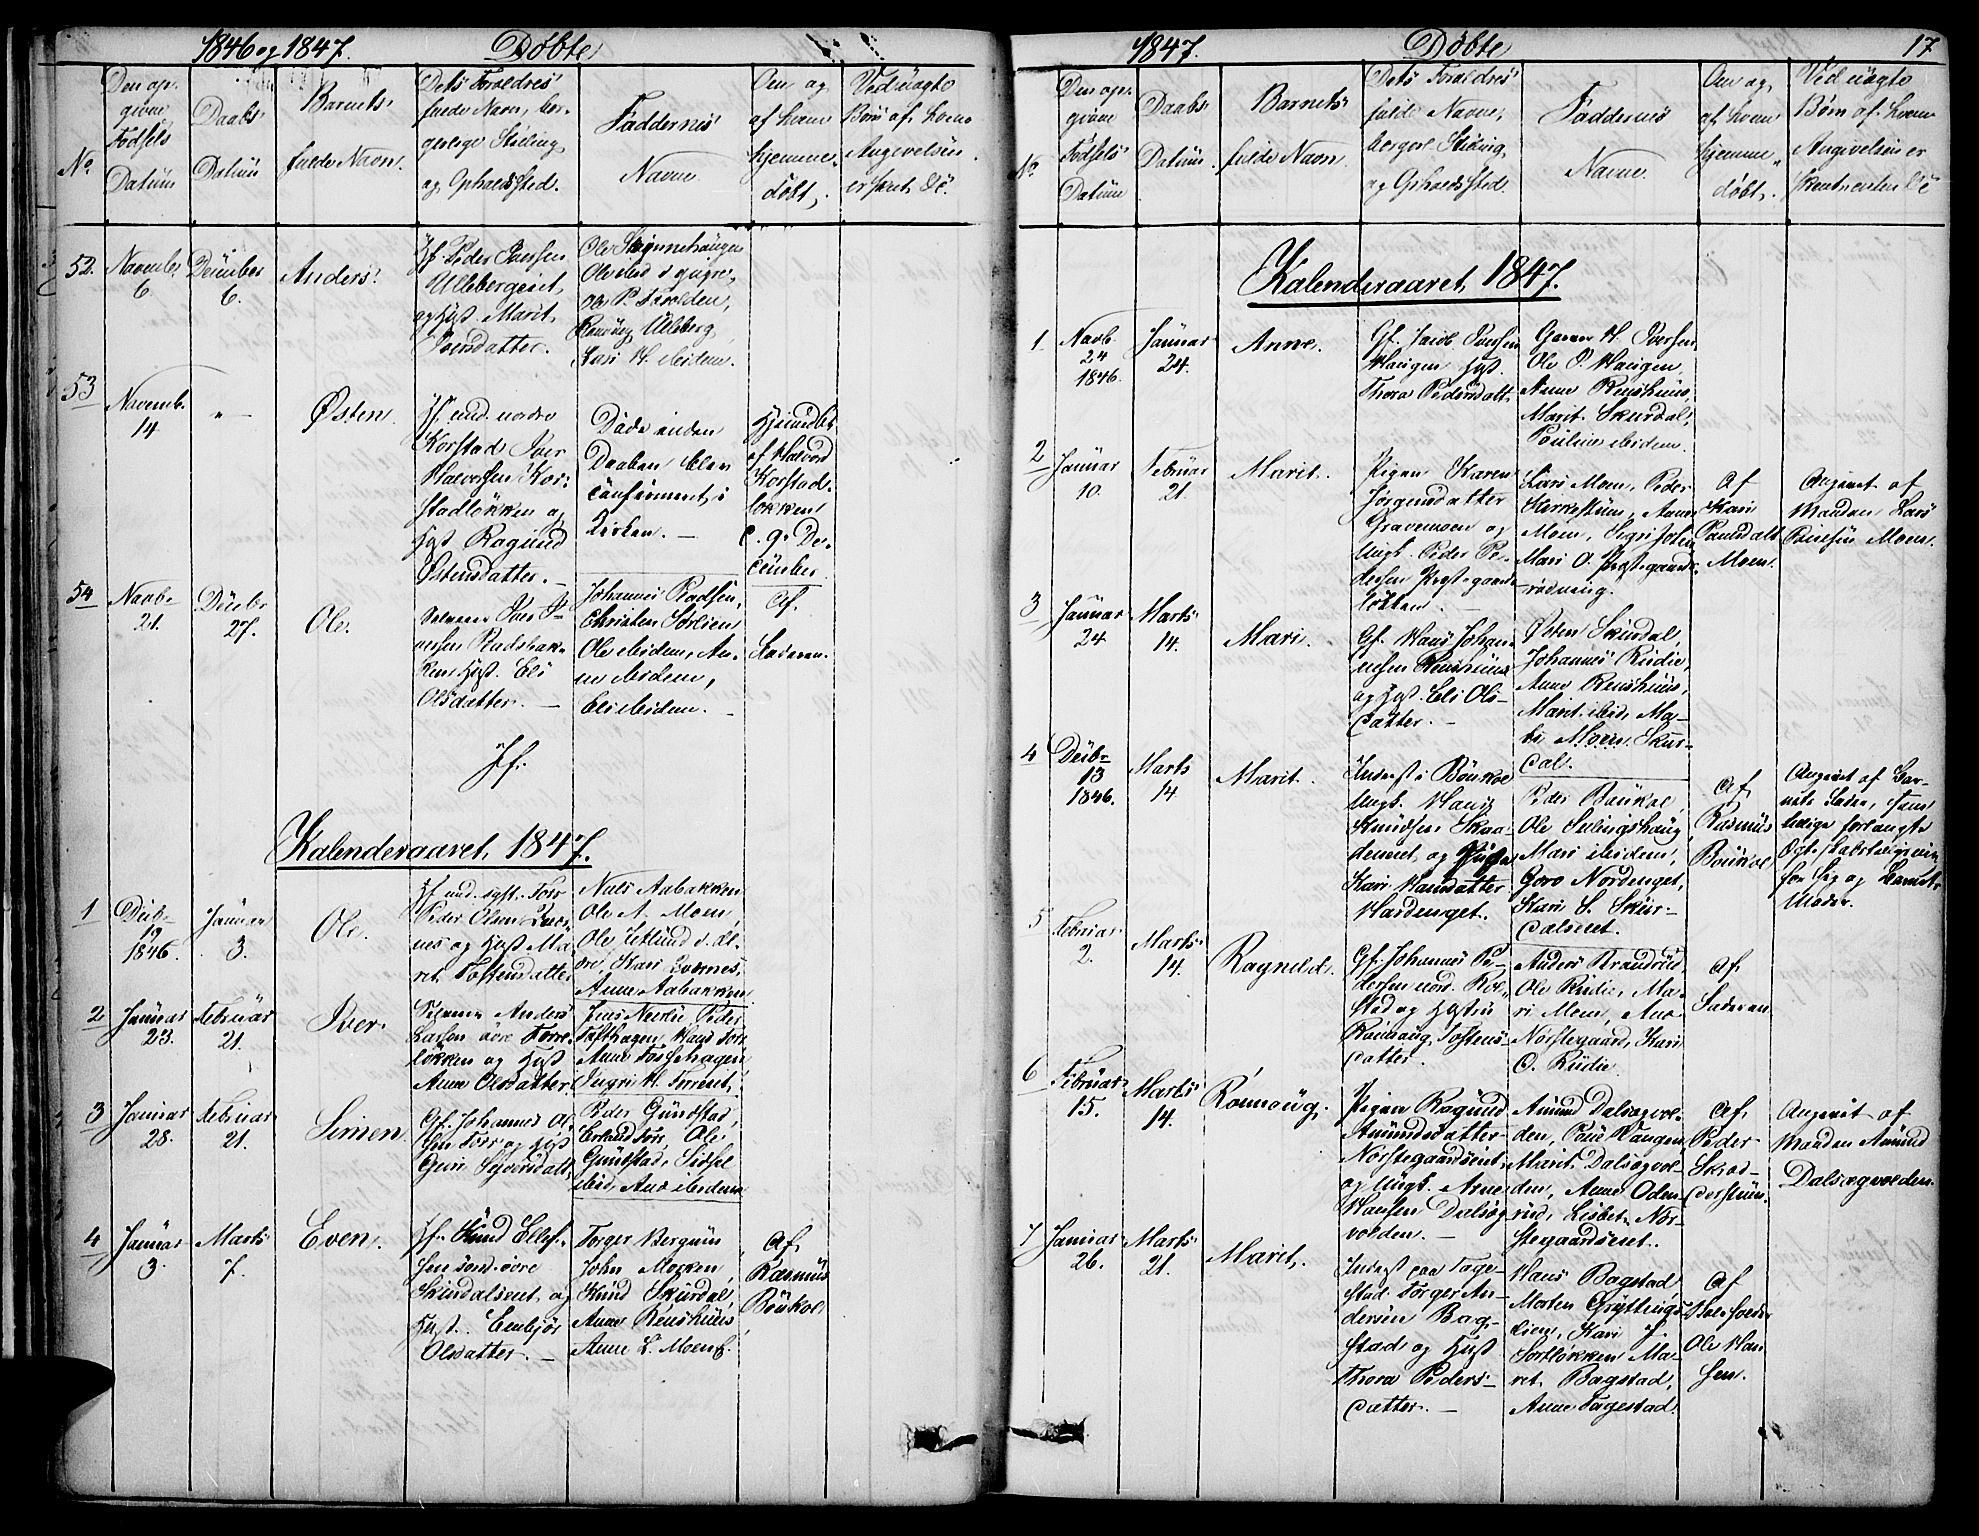 SAH, Sør-Fron prestekontor, H/Ha/Hab/L0001: Klokkerbok nr. 1, 1844-1863, s. 17